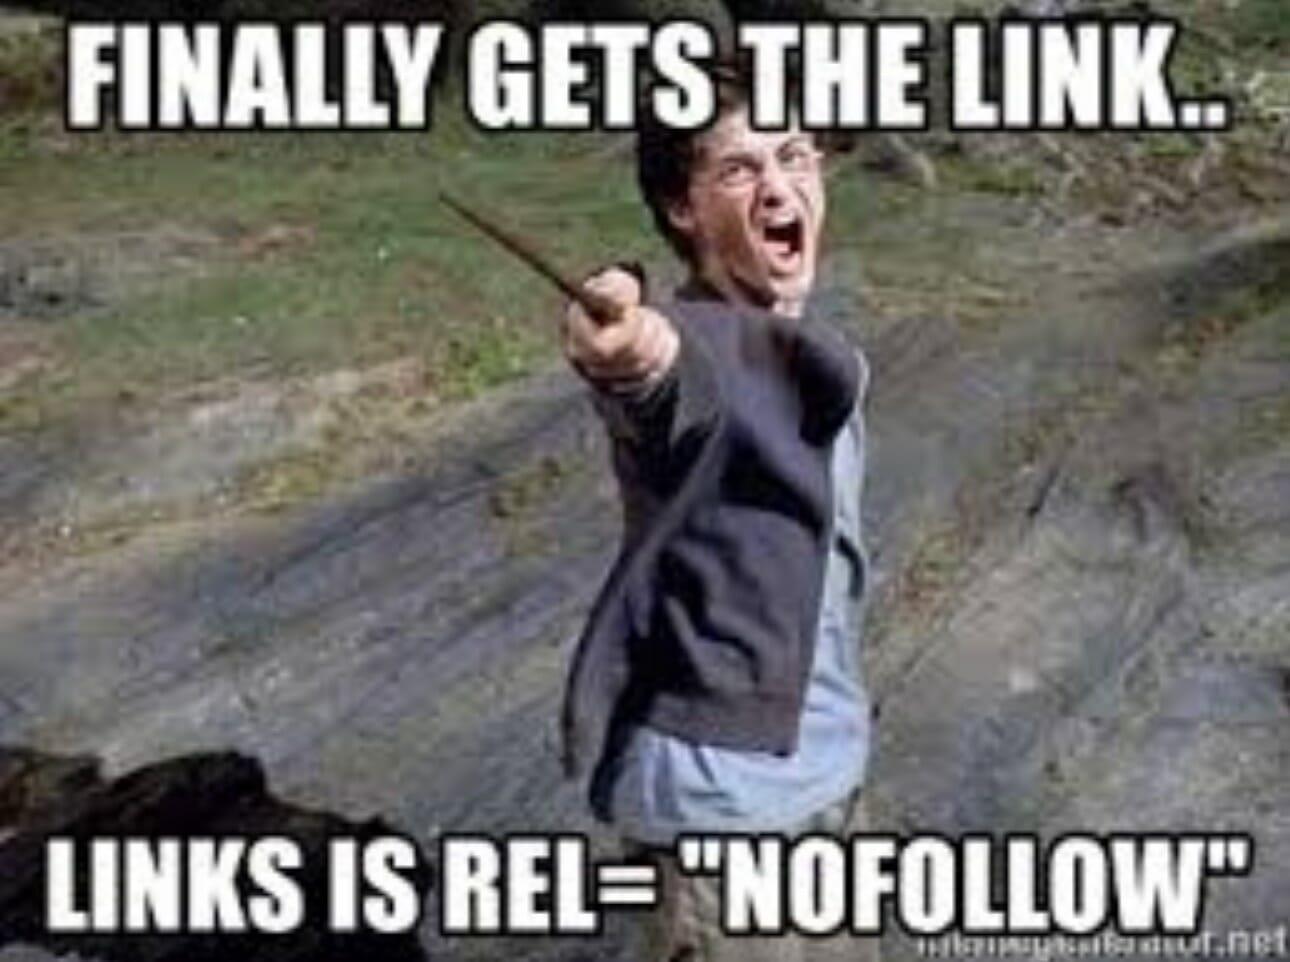 nofolllow harry potter meme